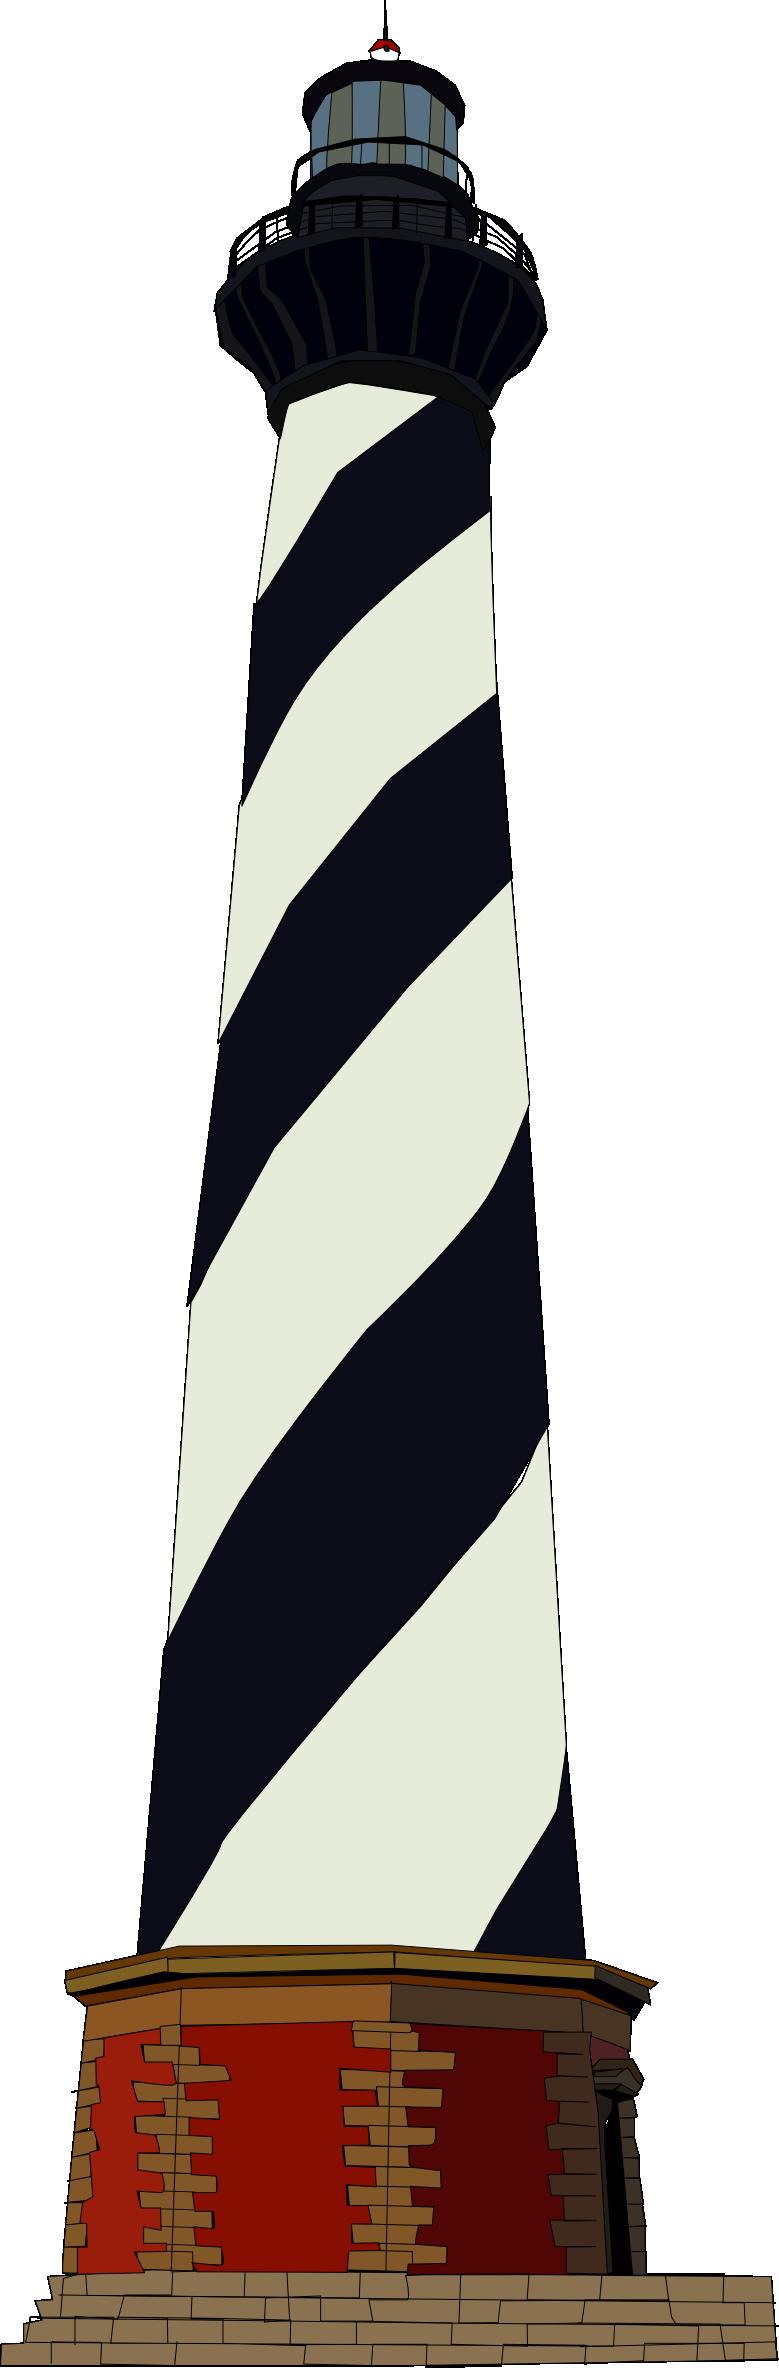 Cape hatteras lighthouse clipart.